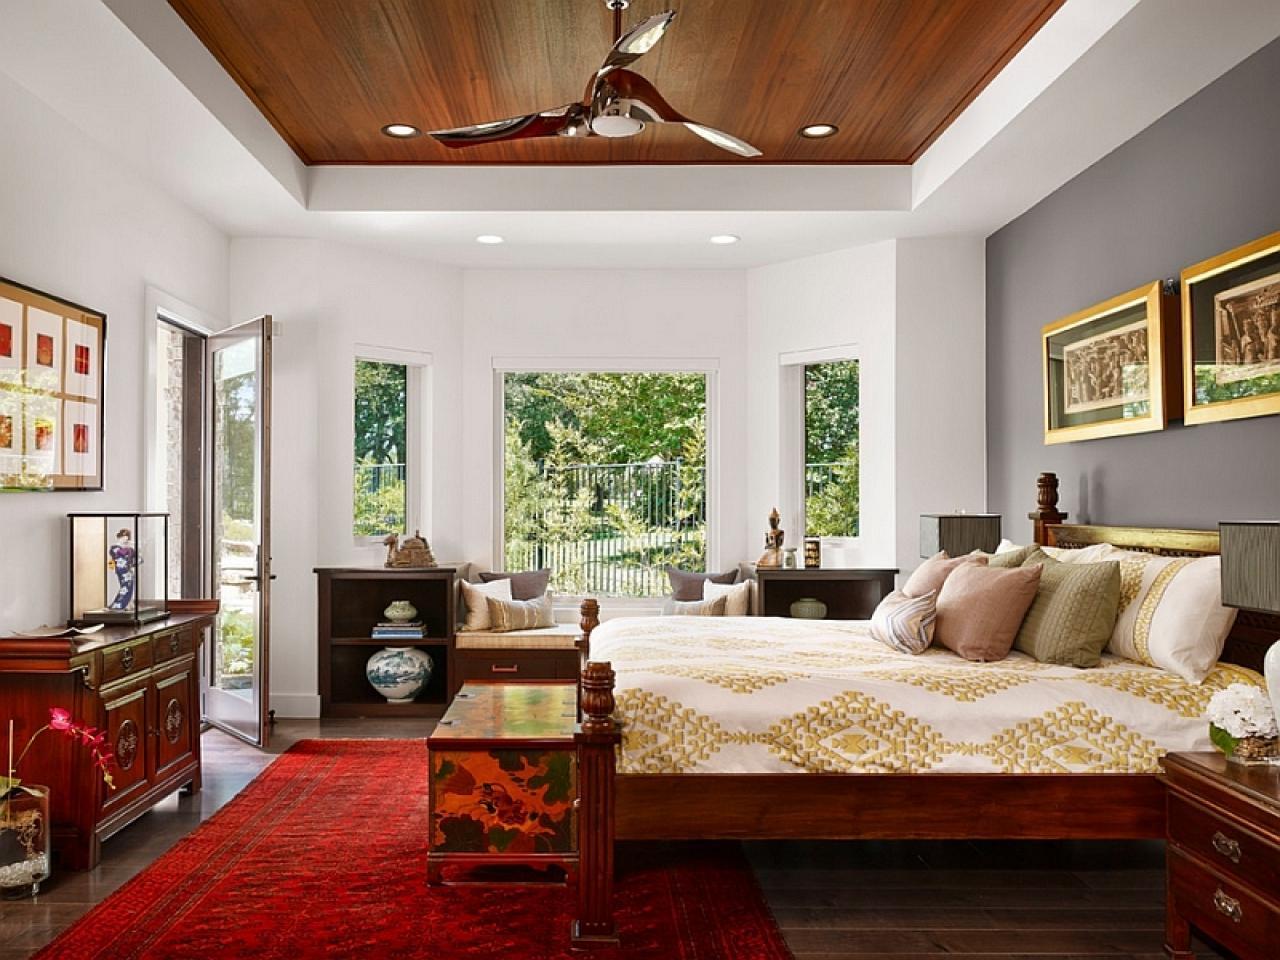 Interior decorating in asian style, modern interior design trends